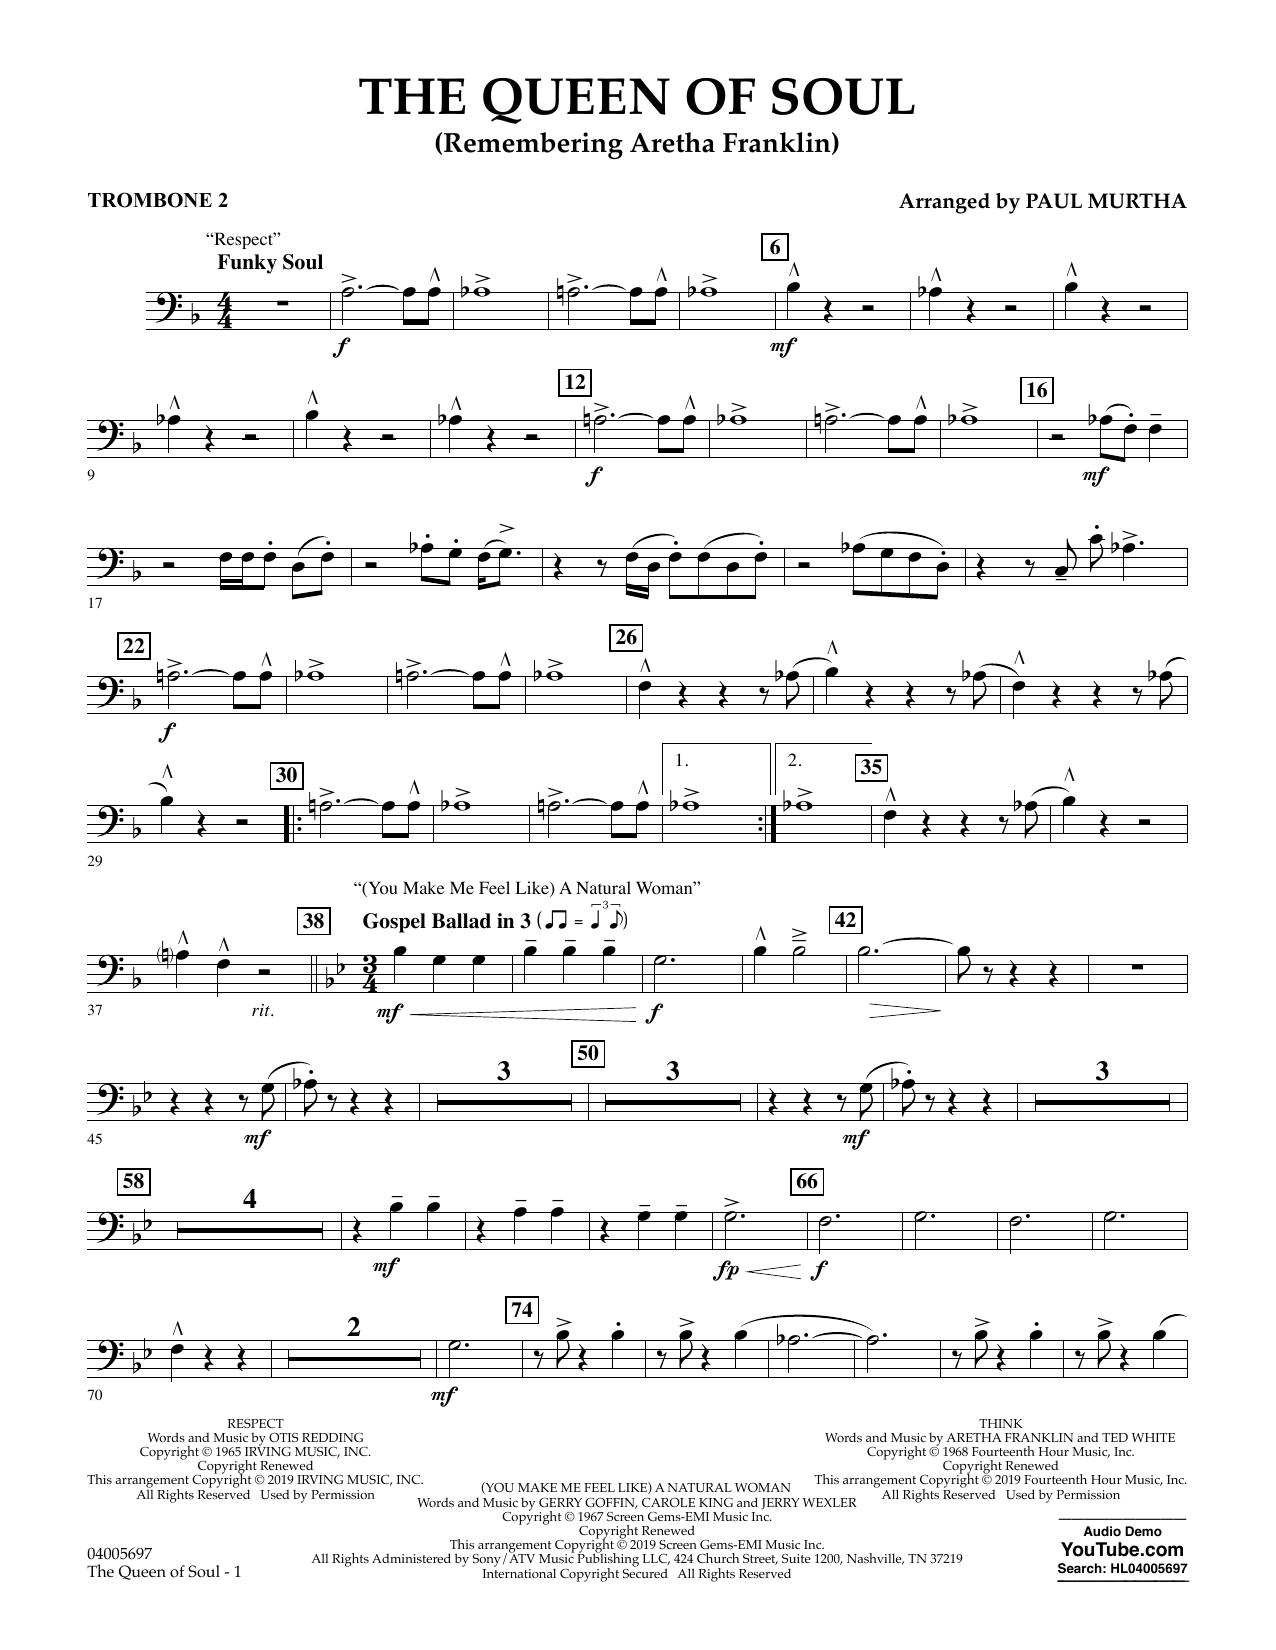 The Queen Of Soul (arr. Paul Murtha)- Conductor Score (Full Score) - Trombone 2 (Concert Band)